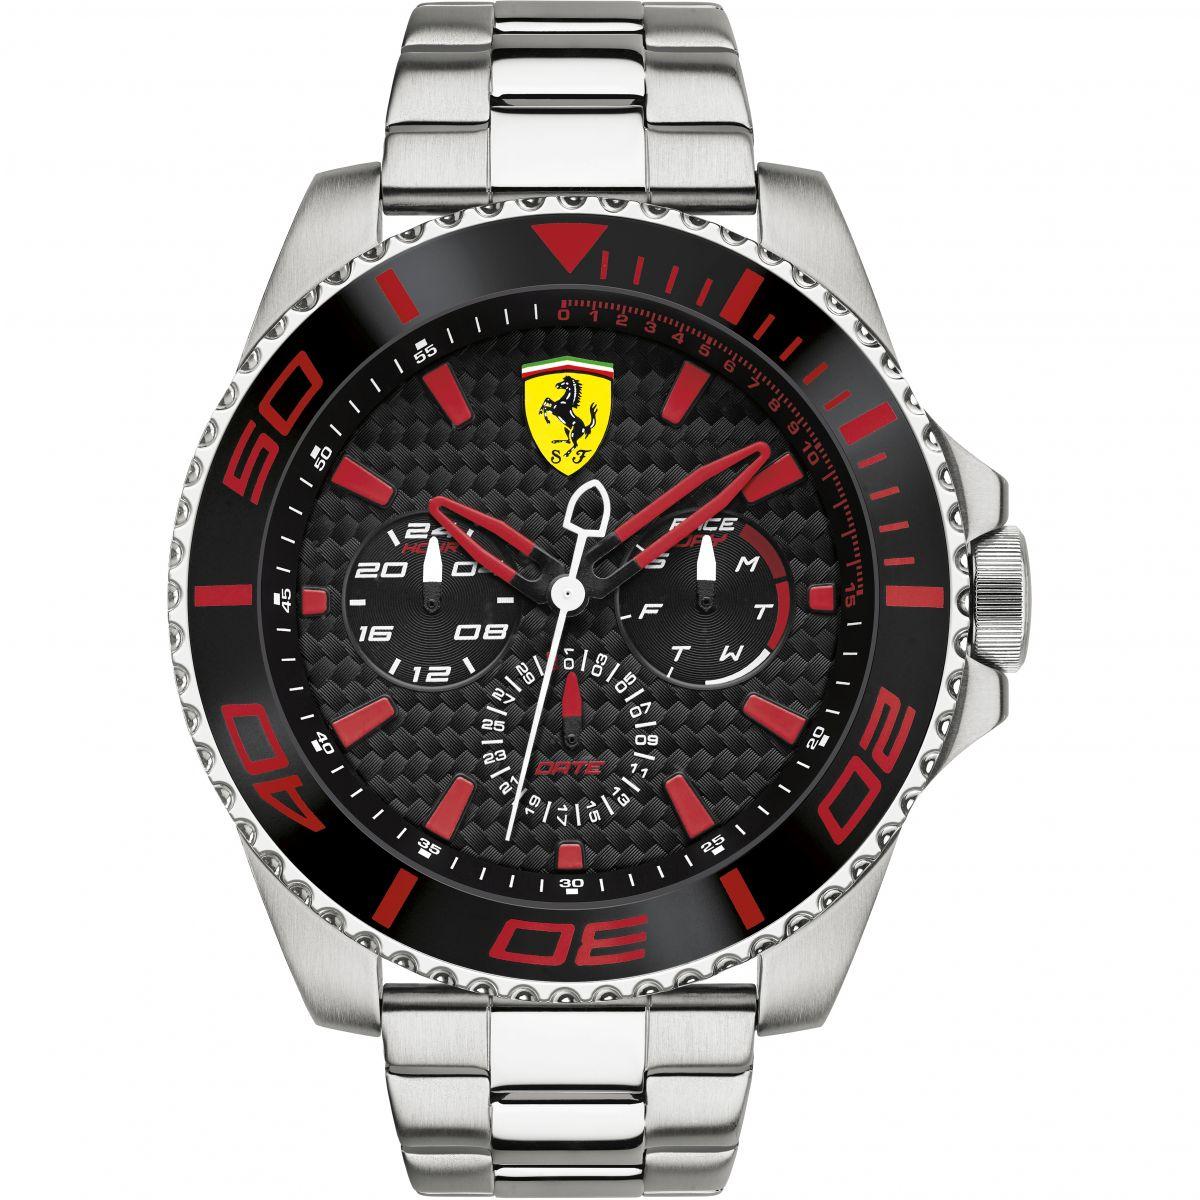 mens black display quartz watch amazon ferrari analog com men dp s redrev evo